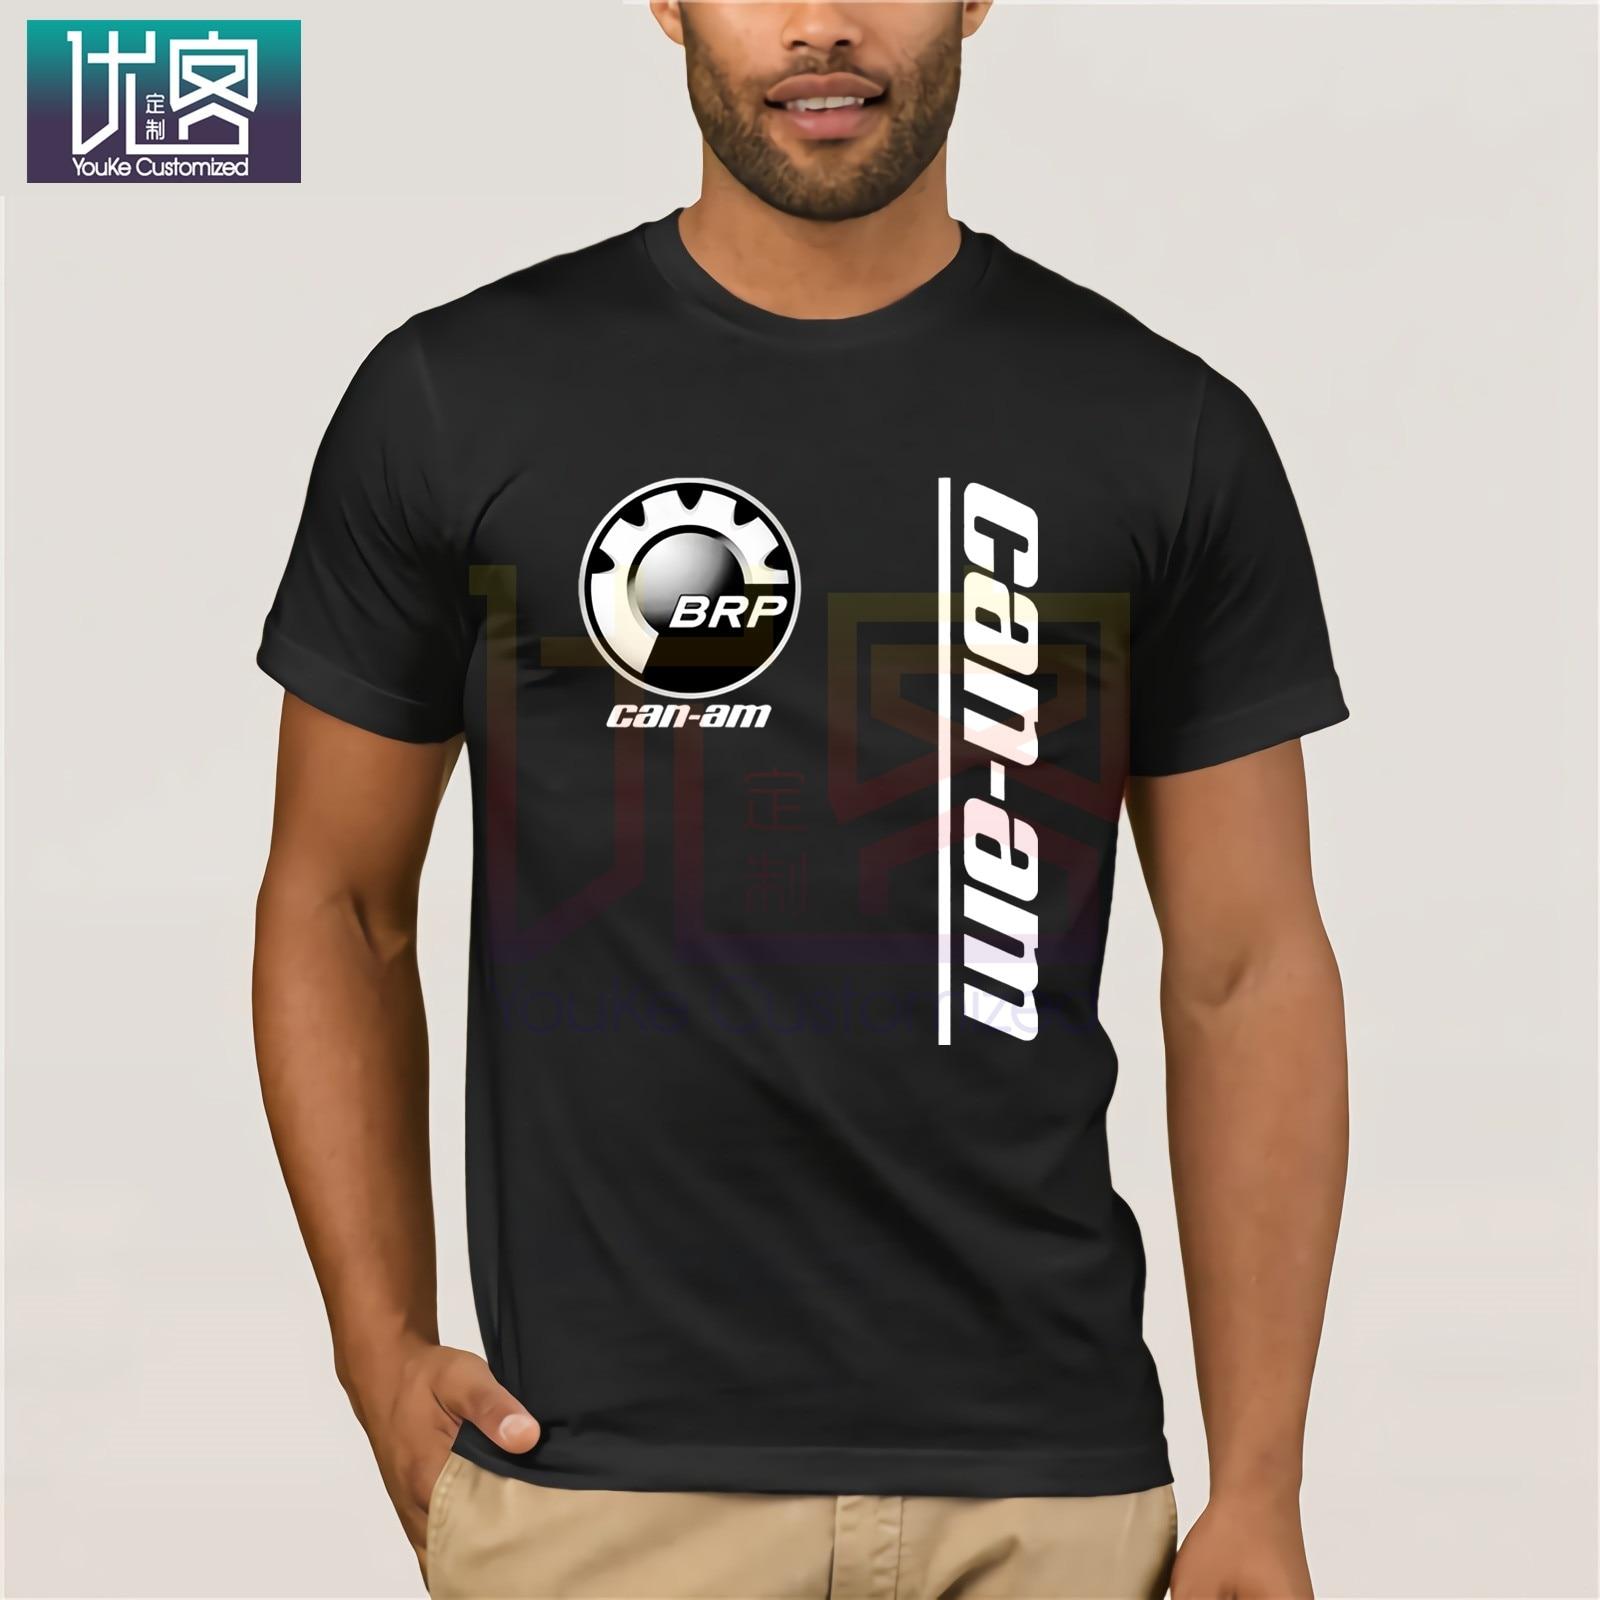 POPULAR T Shirt CAN AM Logo BRP ATV Renegade UTV Outlander SIZES USA S - 3XL Clothes Popular T-Shirt Crewneck 100% Cotton Tees